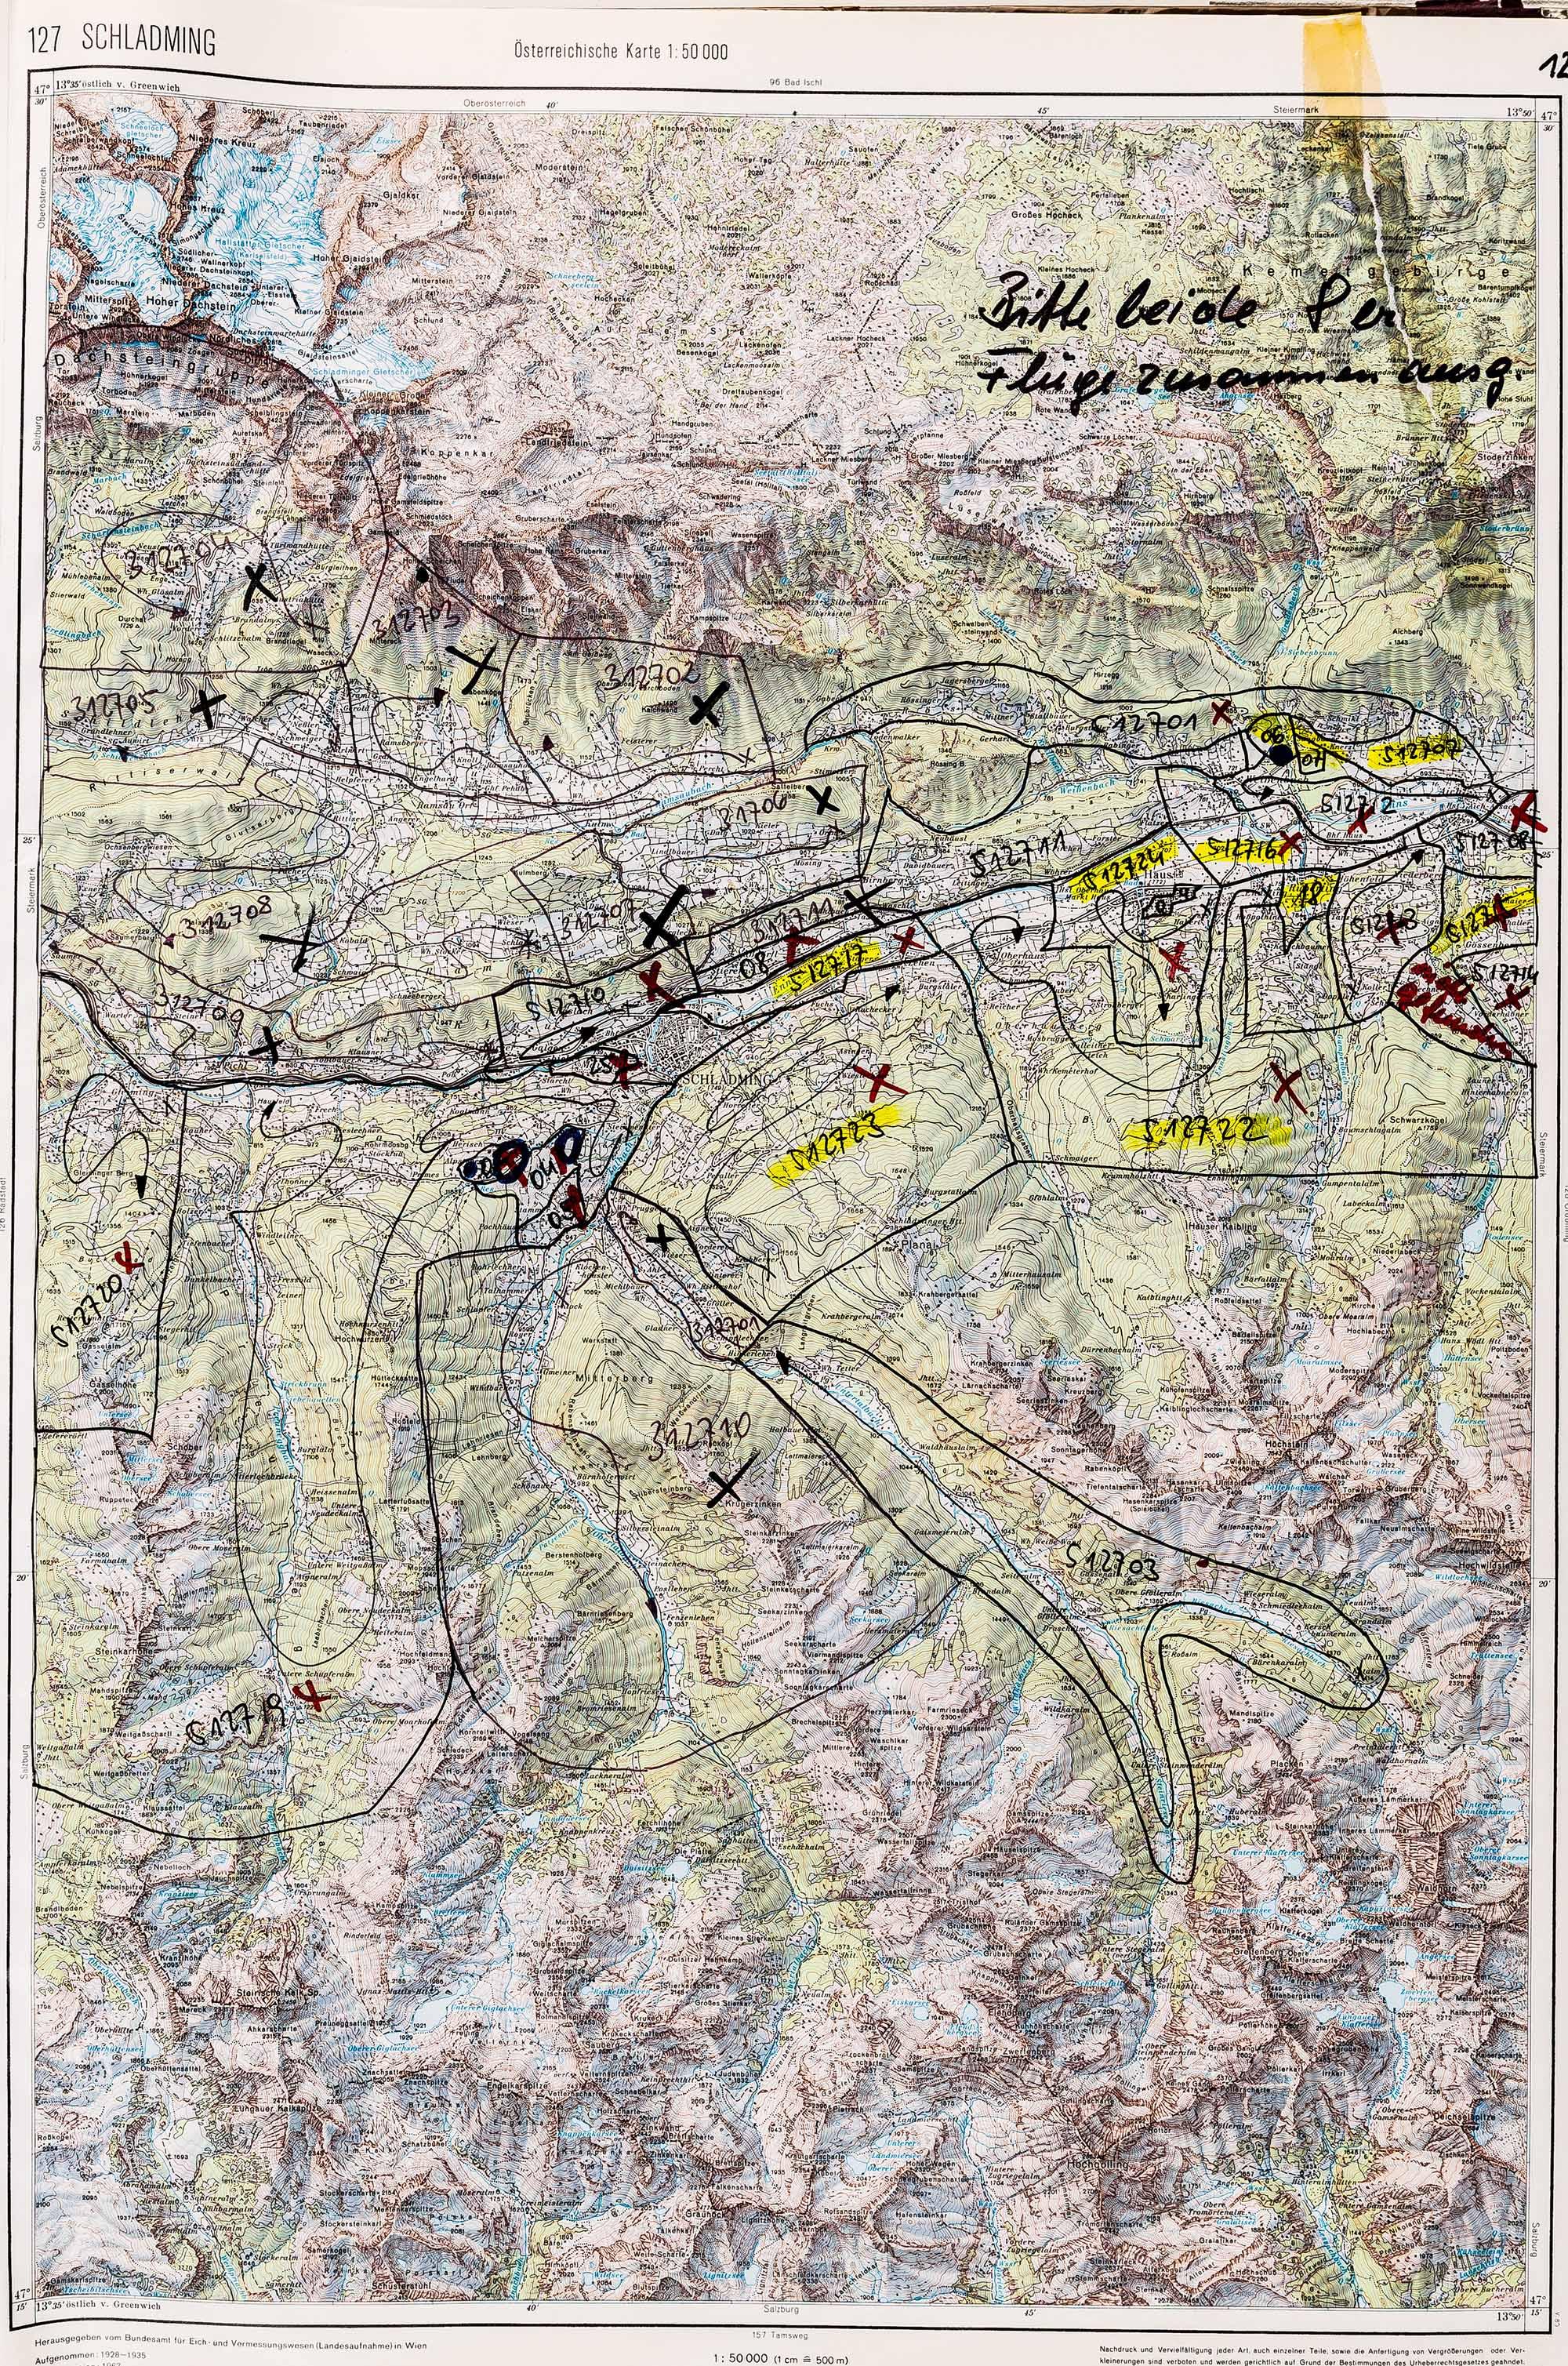 1983-1986 Karte 127